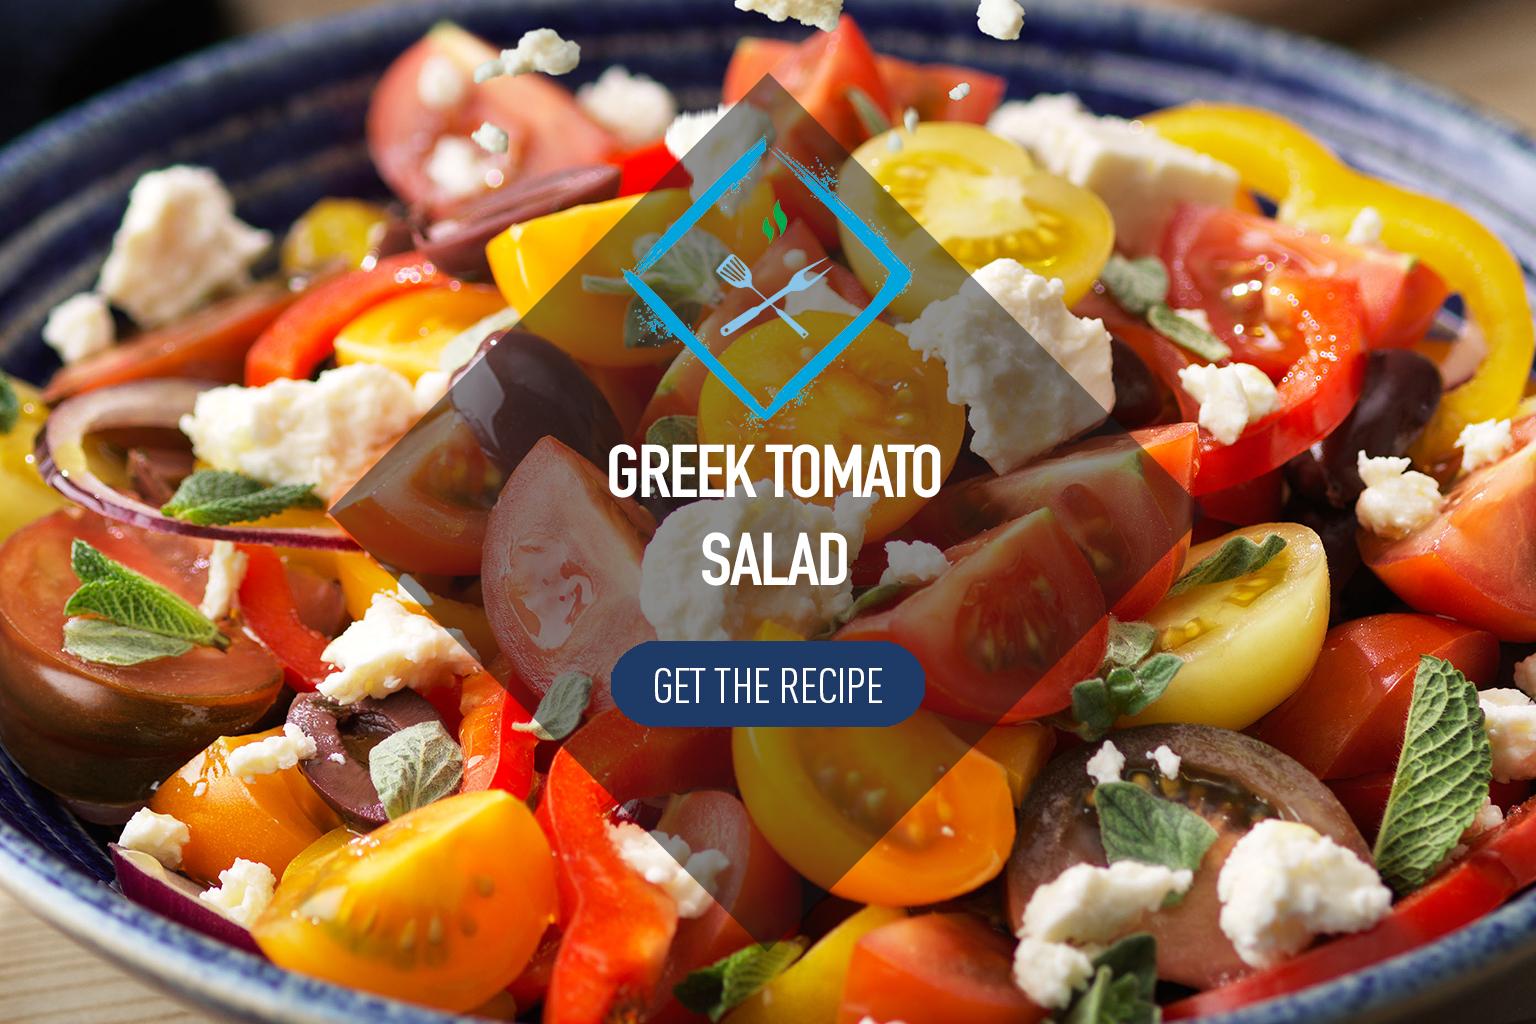 Greek Tomato Salad with White Cheese